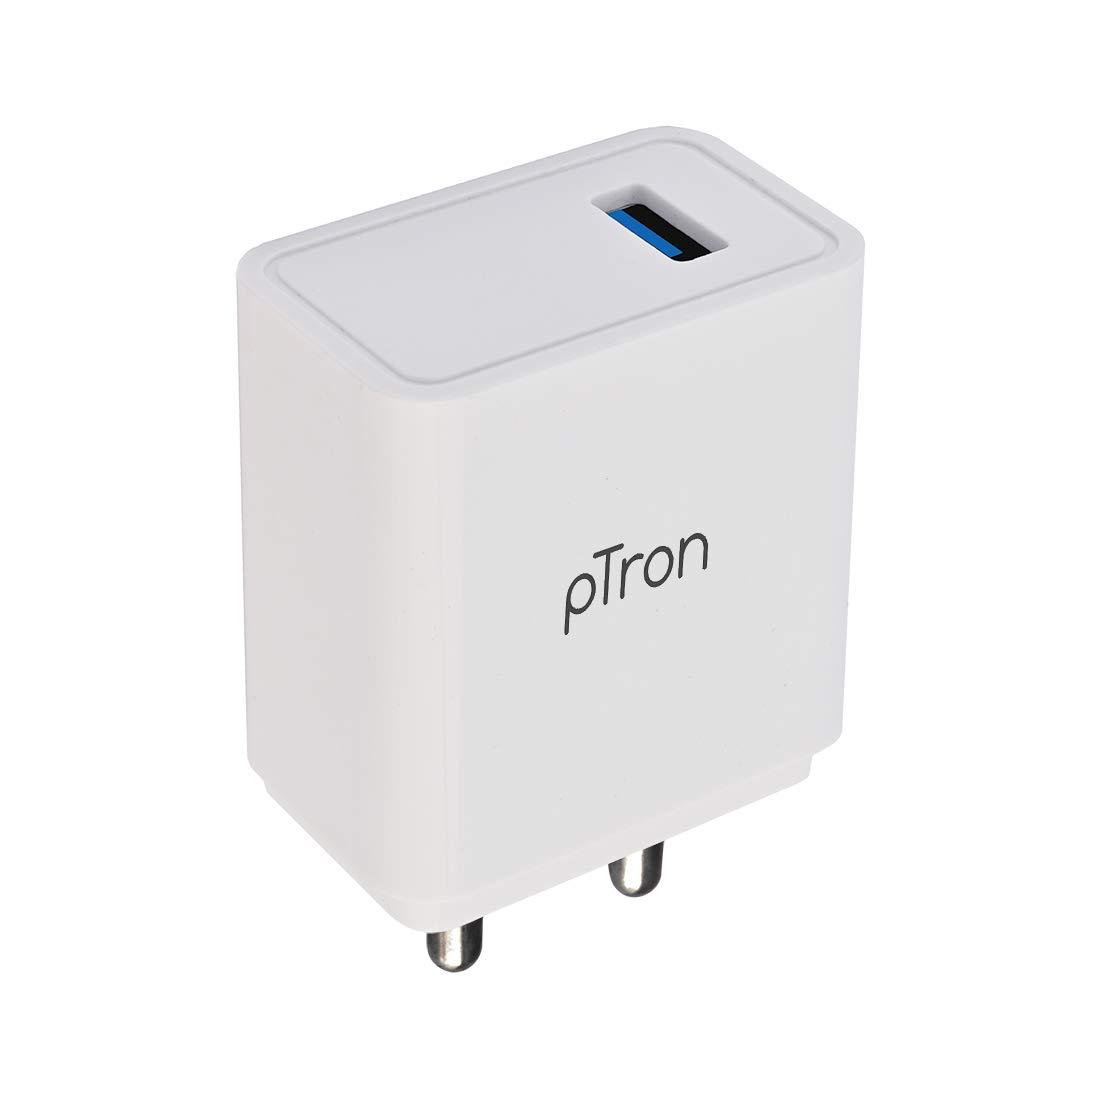 pTron 17W Volta Single USB Smart Charger $3.36 Coupon